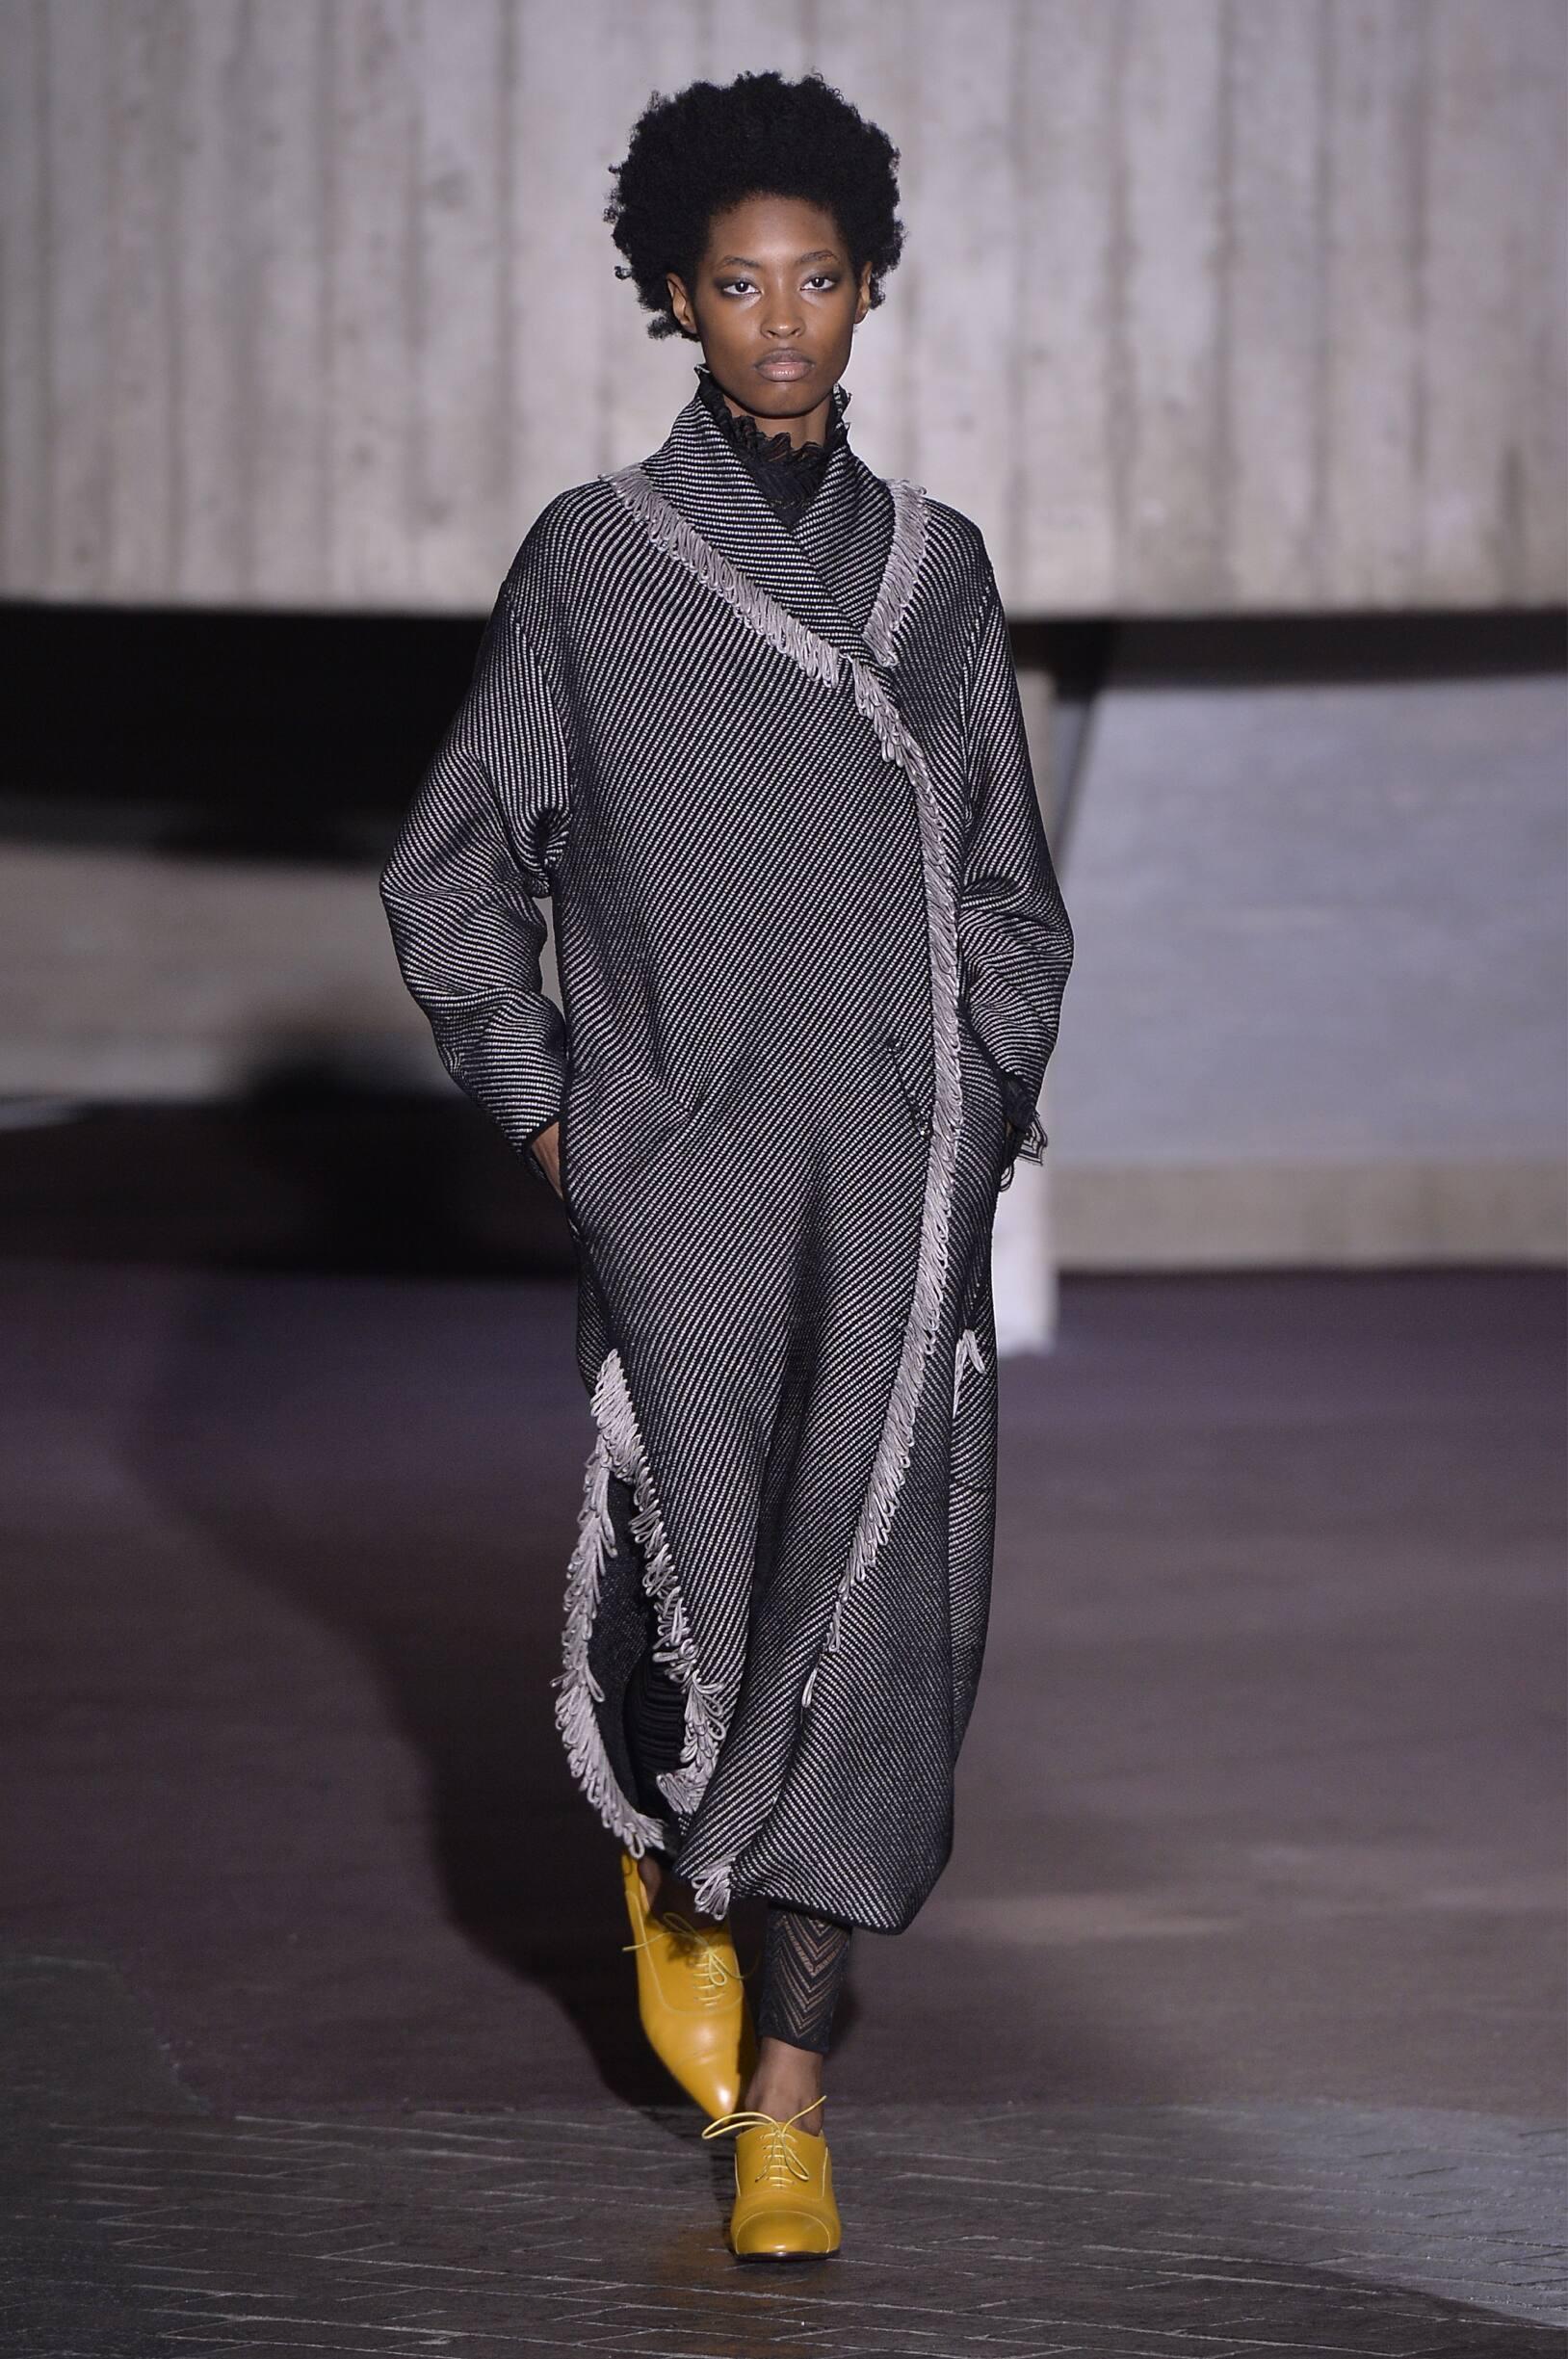 Catwalk Roland Mouret Woman Fashion Show Winter 2018